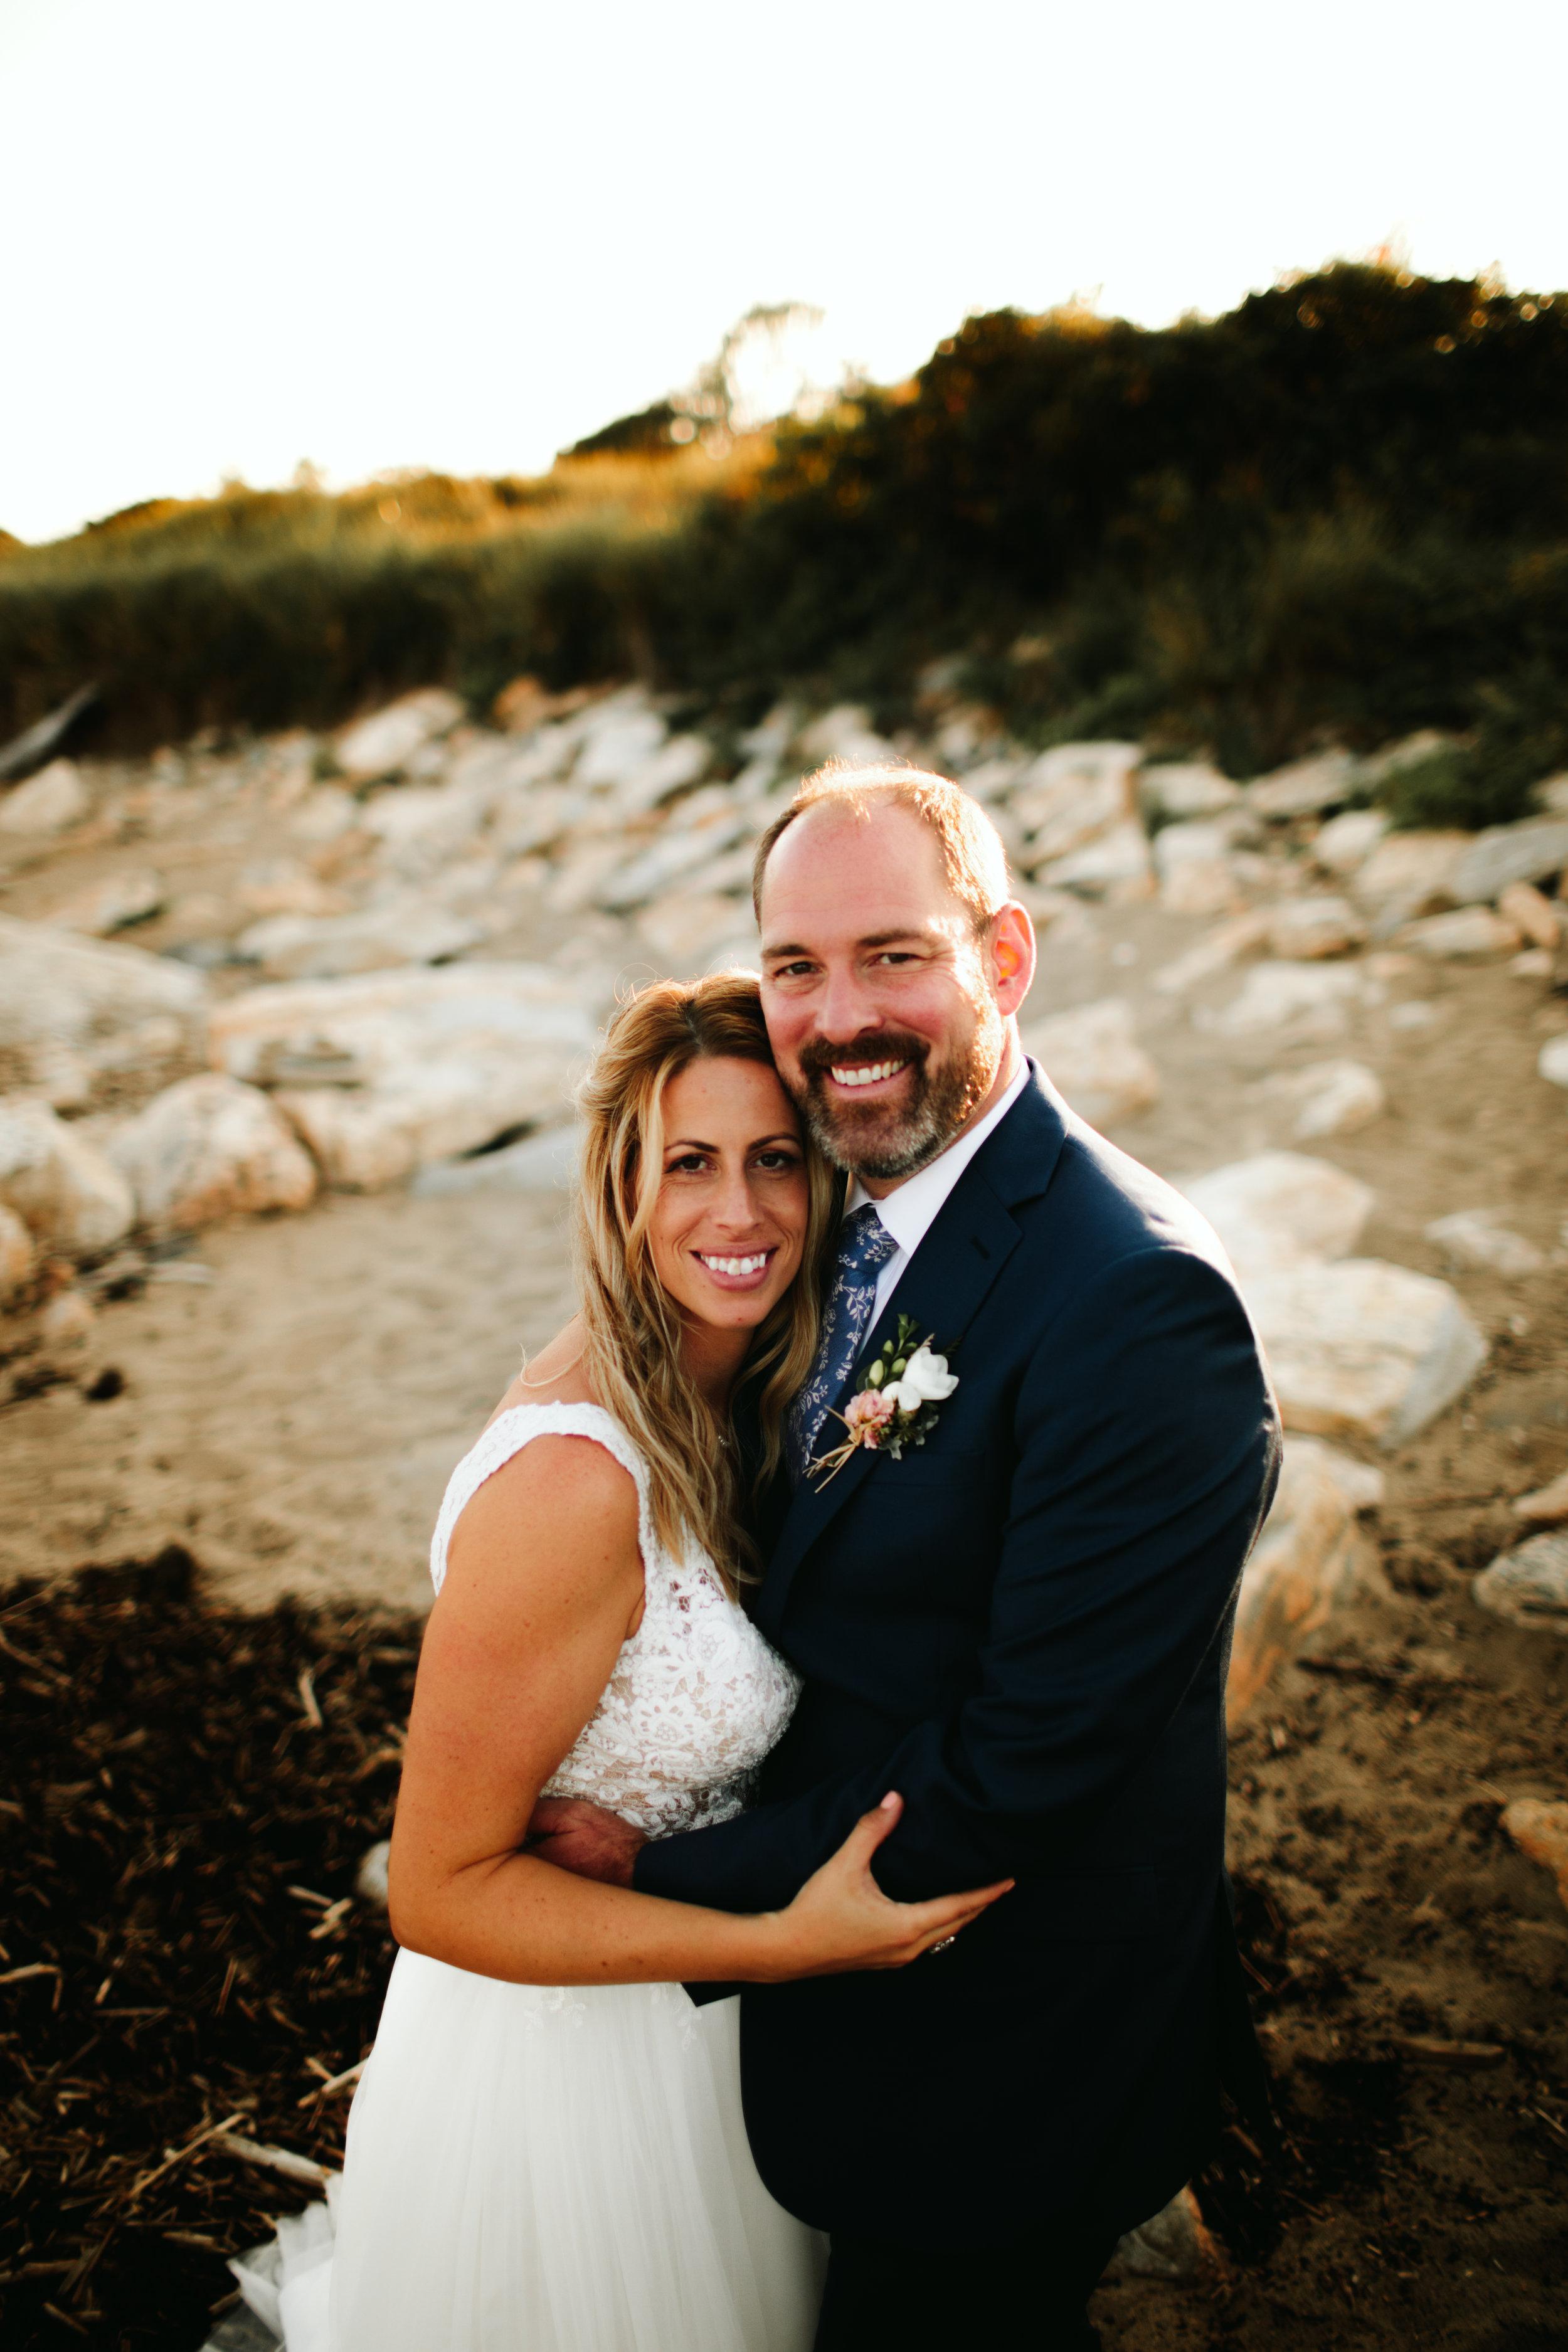 COUPLES-WEDDING-PORTRAIT-REID-STATE-PARK-GEORGETOWN-MAINE-7.jpg